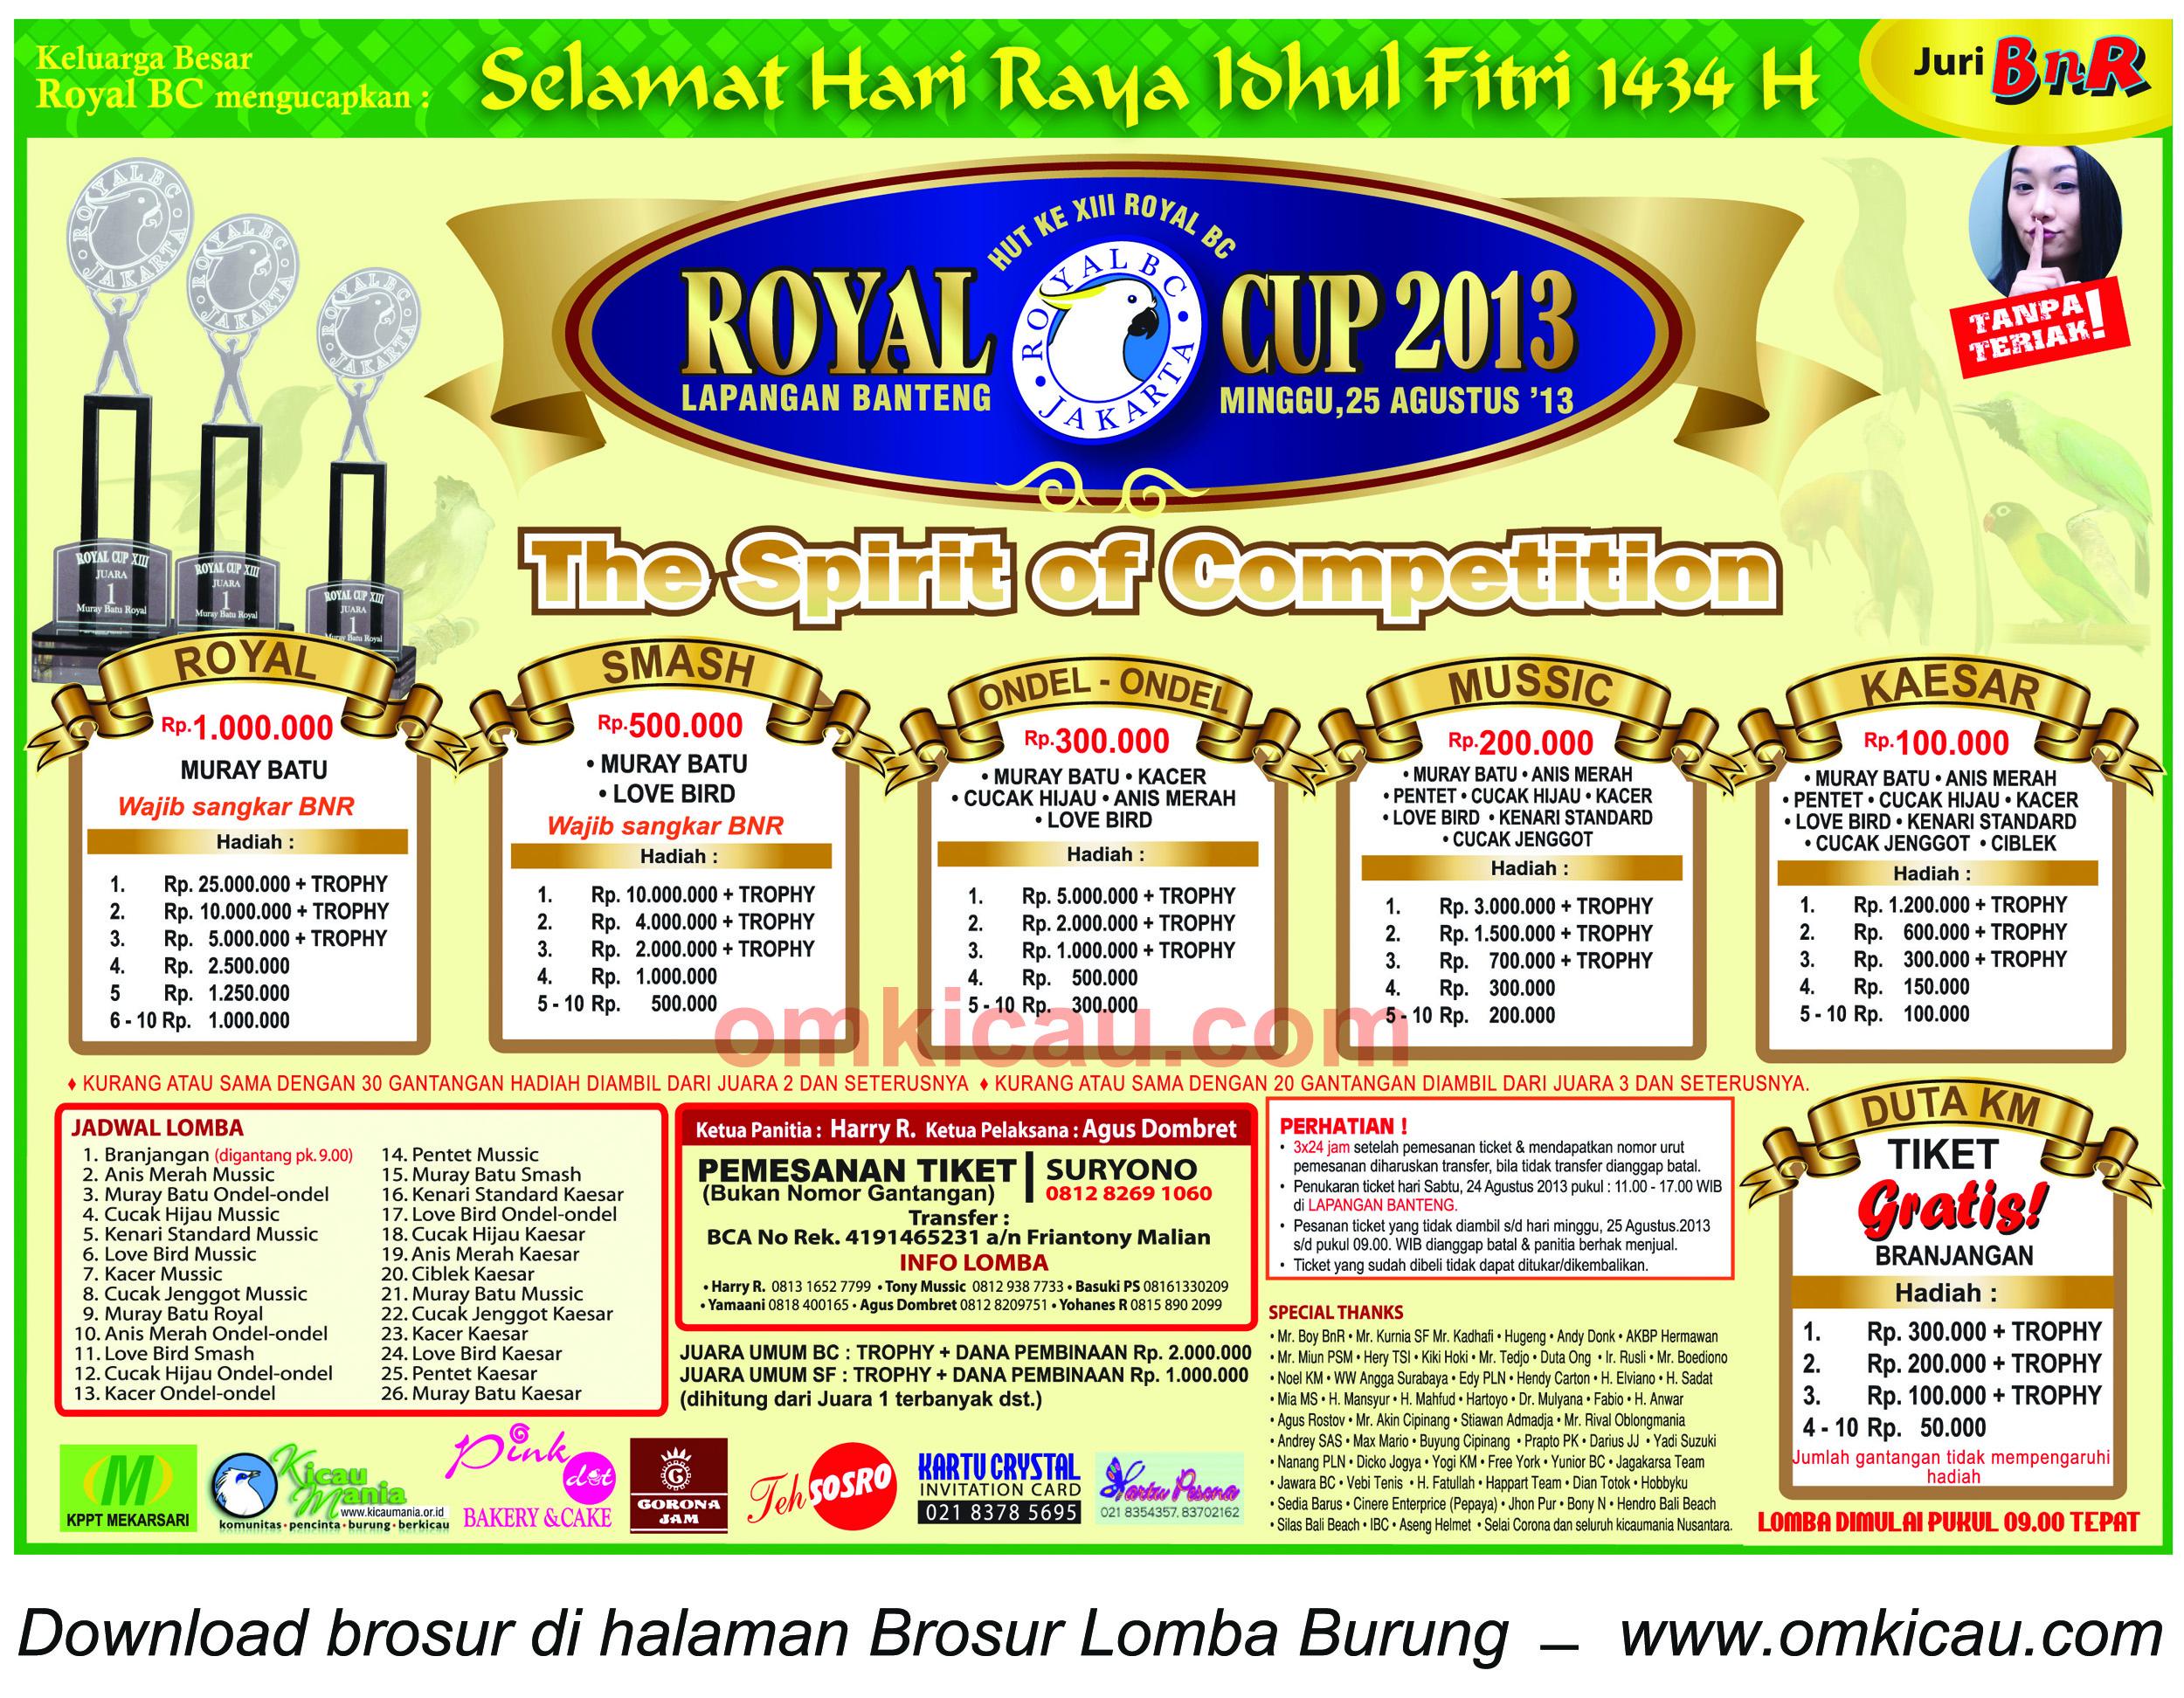 Brosur Lomba Burung Royal Cup Jakarta